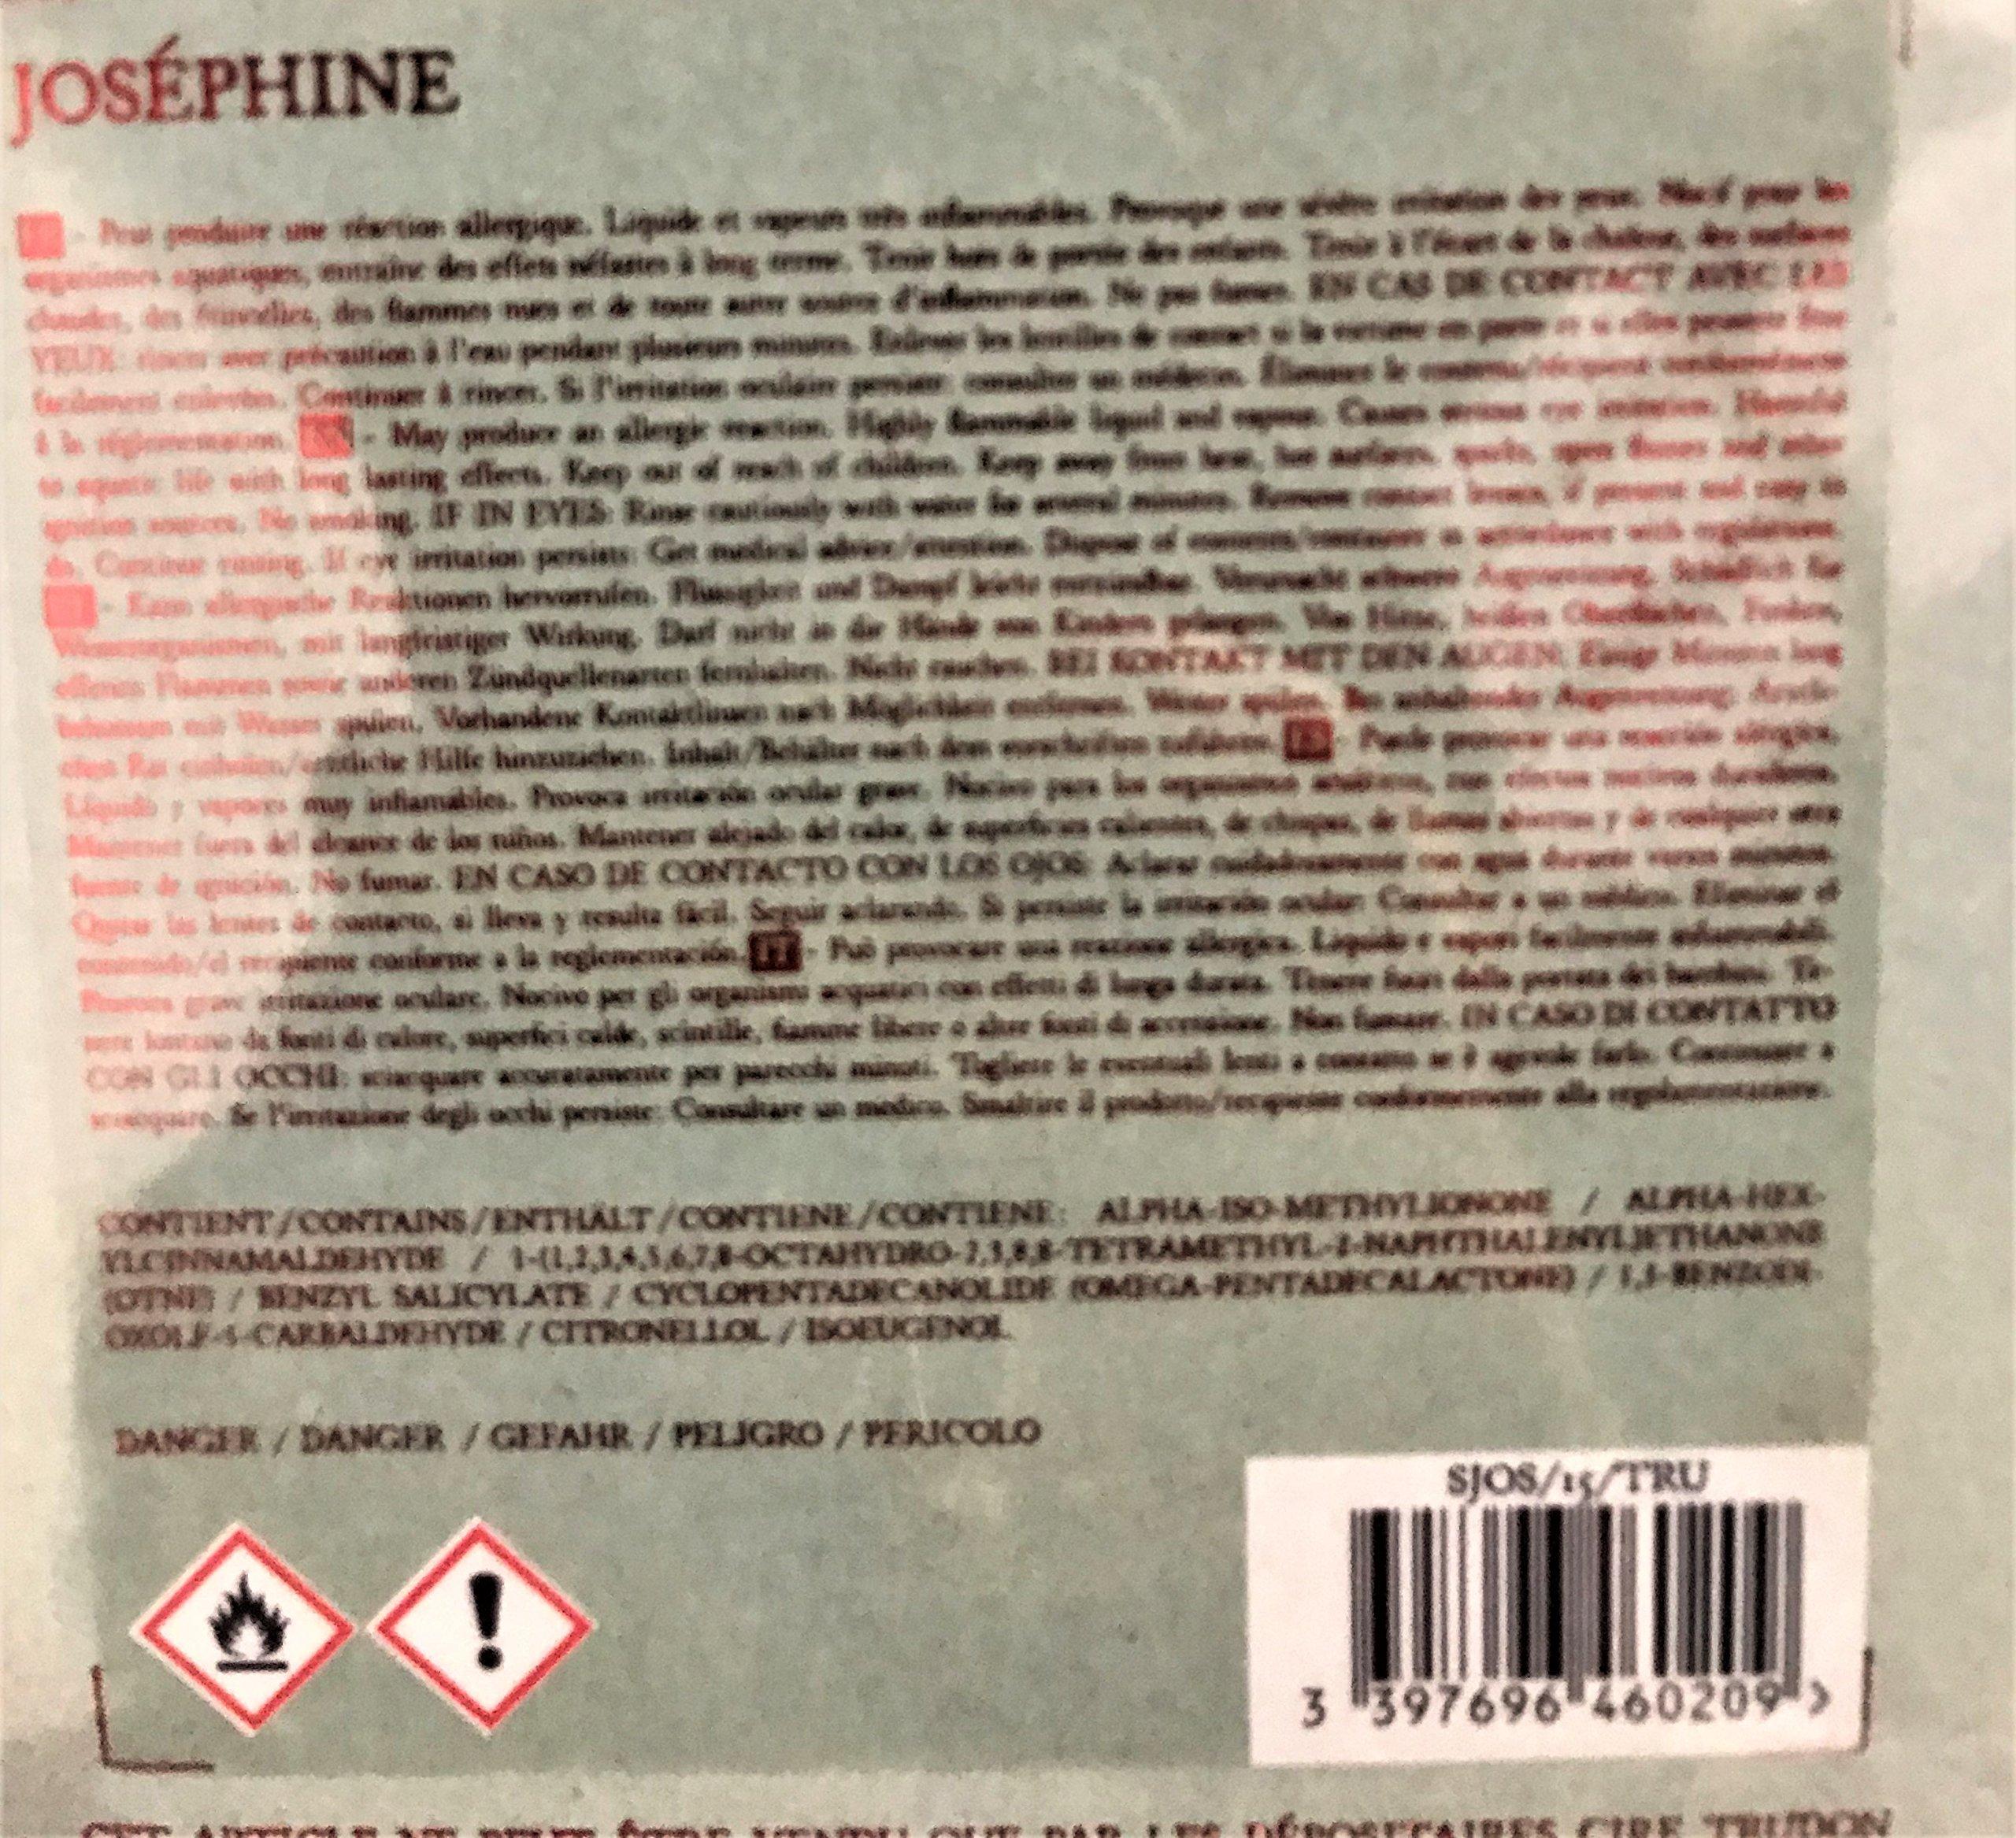 Josephine by Cire Trudon Home Fragrance 12.9 oz by Cire Trudon